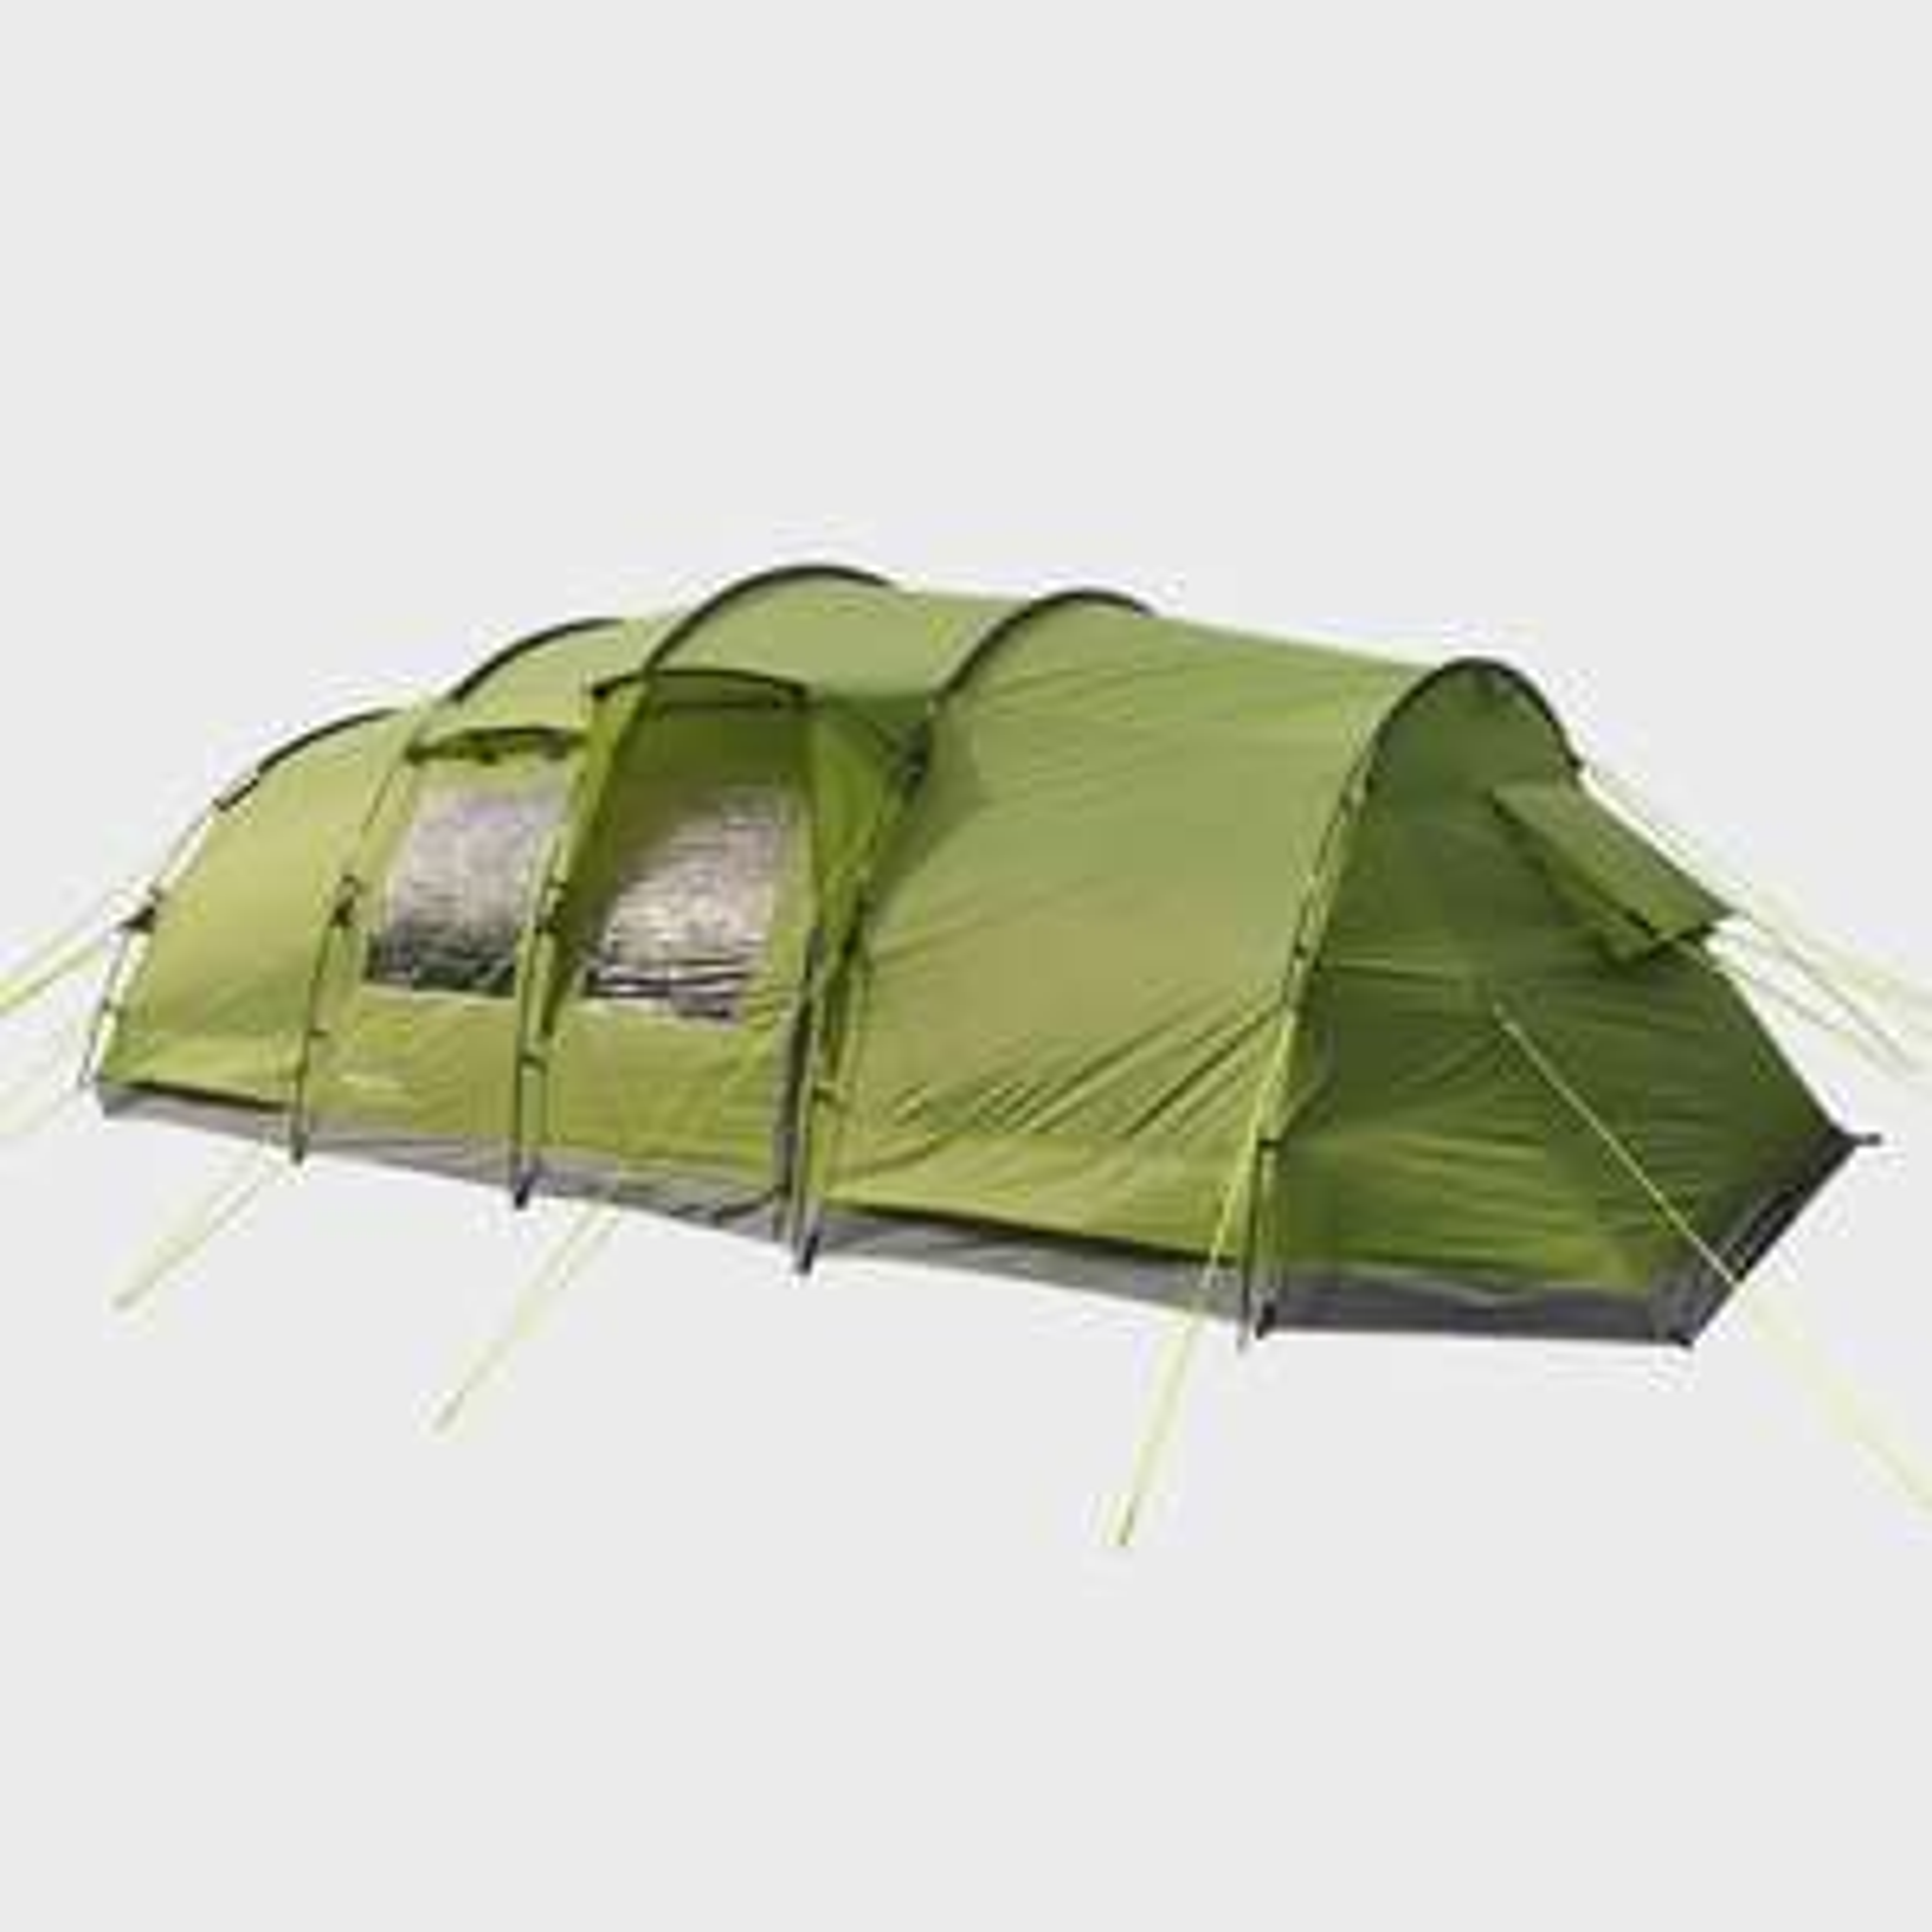 Euro hike 8 man tent - £260 @ Blacks